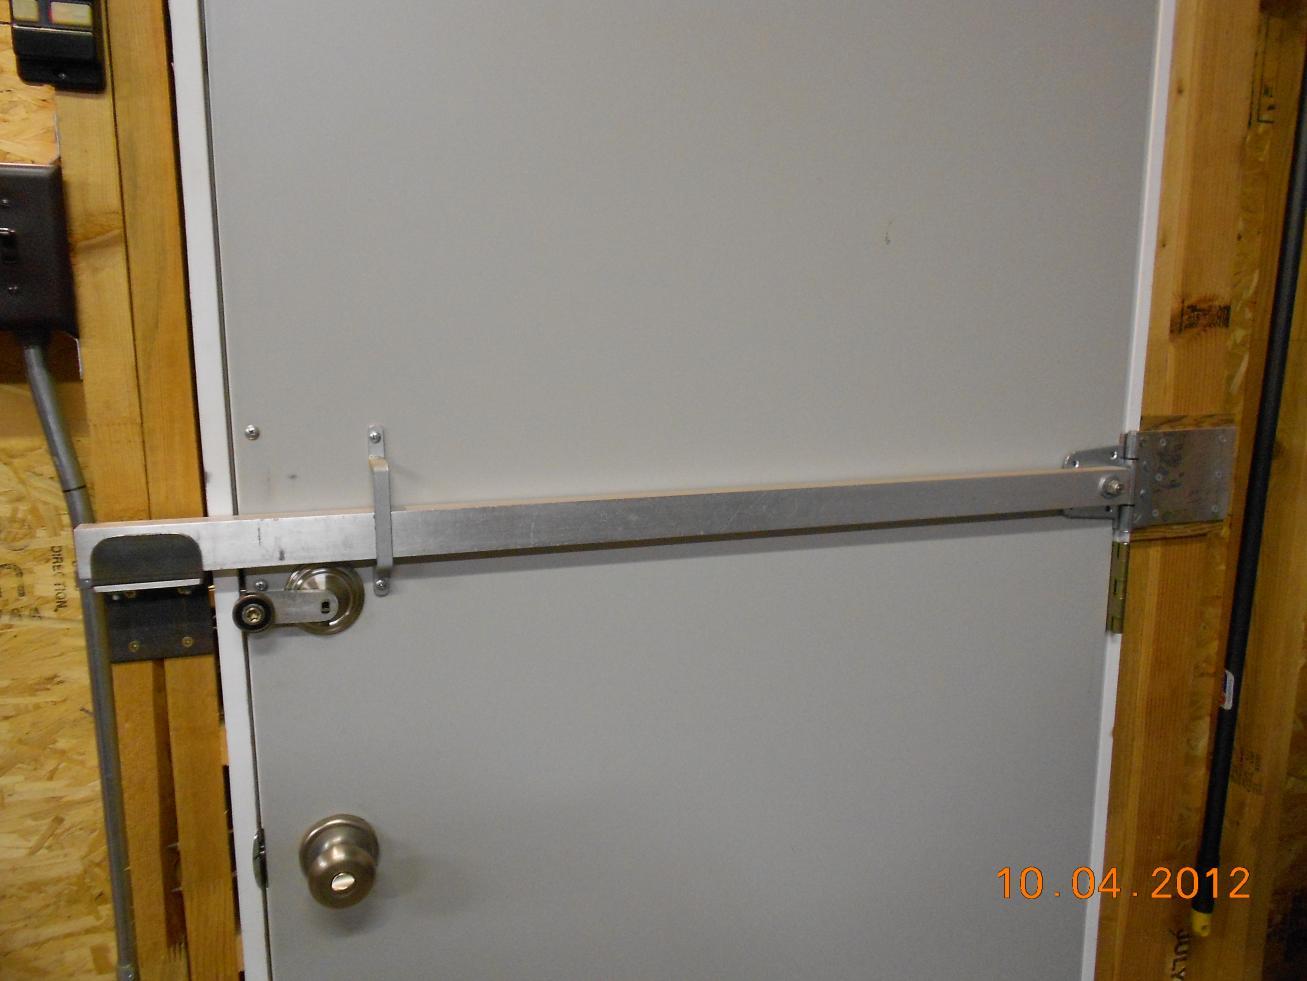 dscn0818.jpg ... & Shop metal doors - Something better than deadbolt exist ? - Page 2